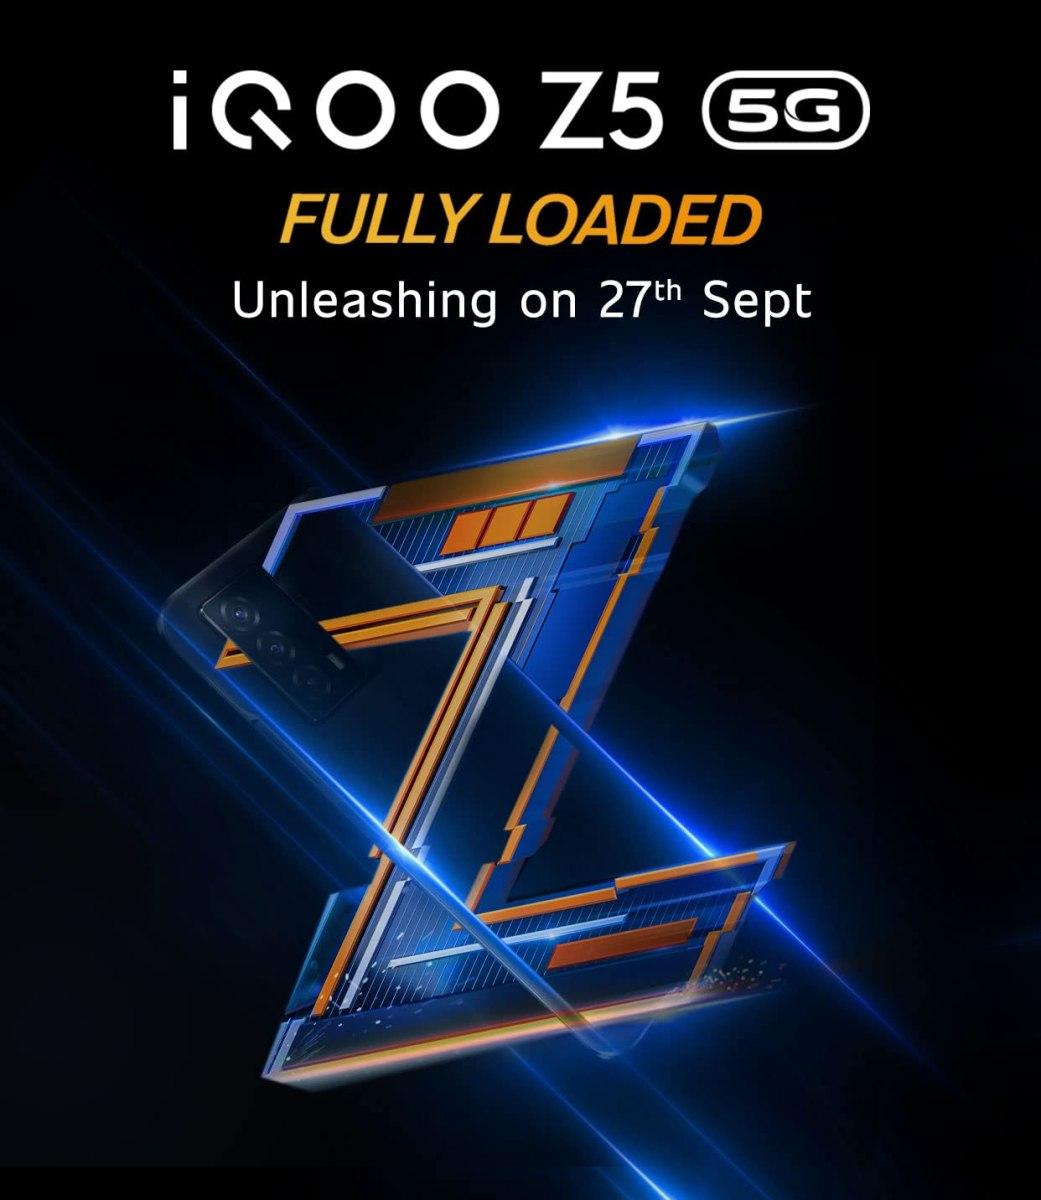 iQOO Z5 5G launch date